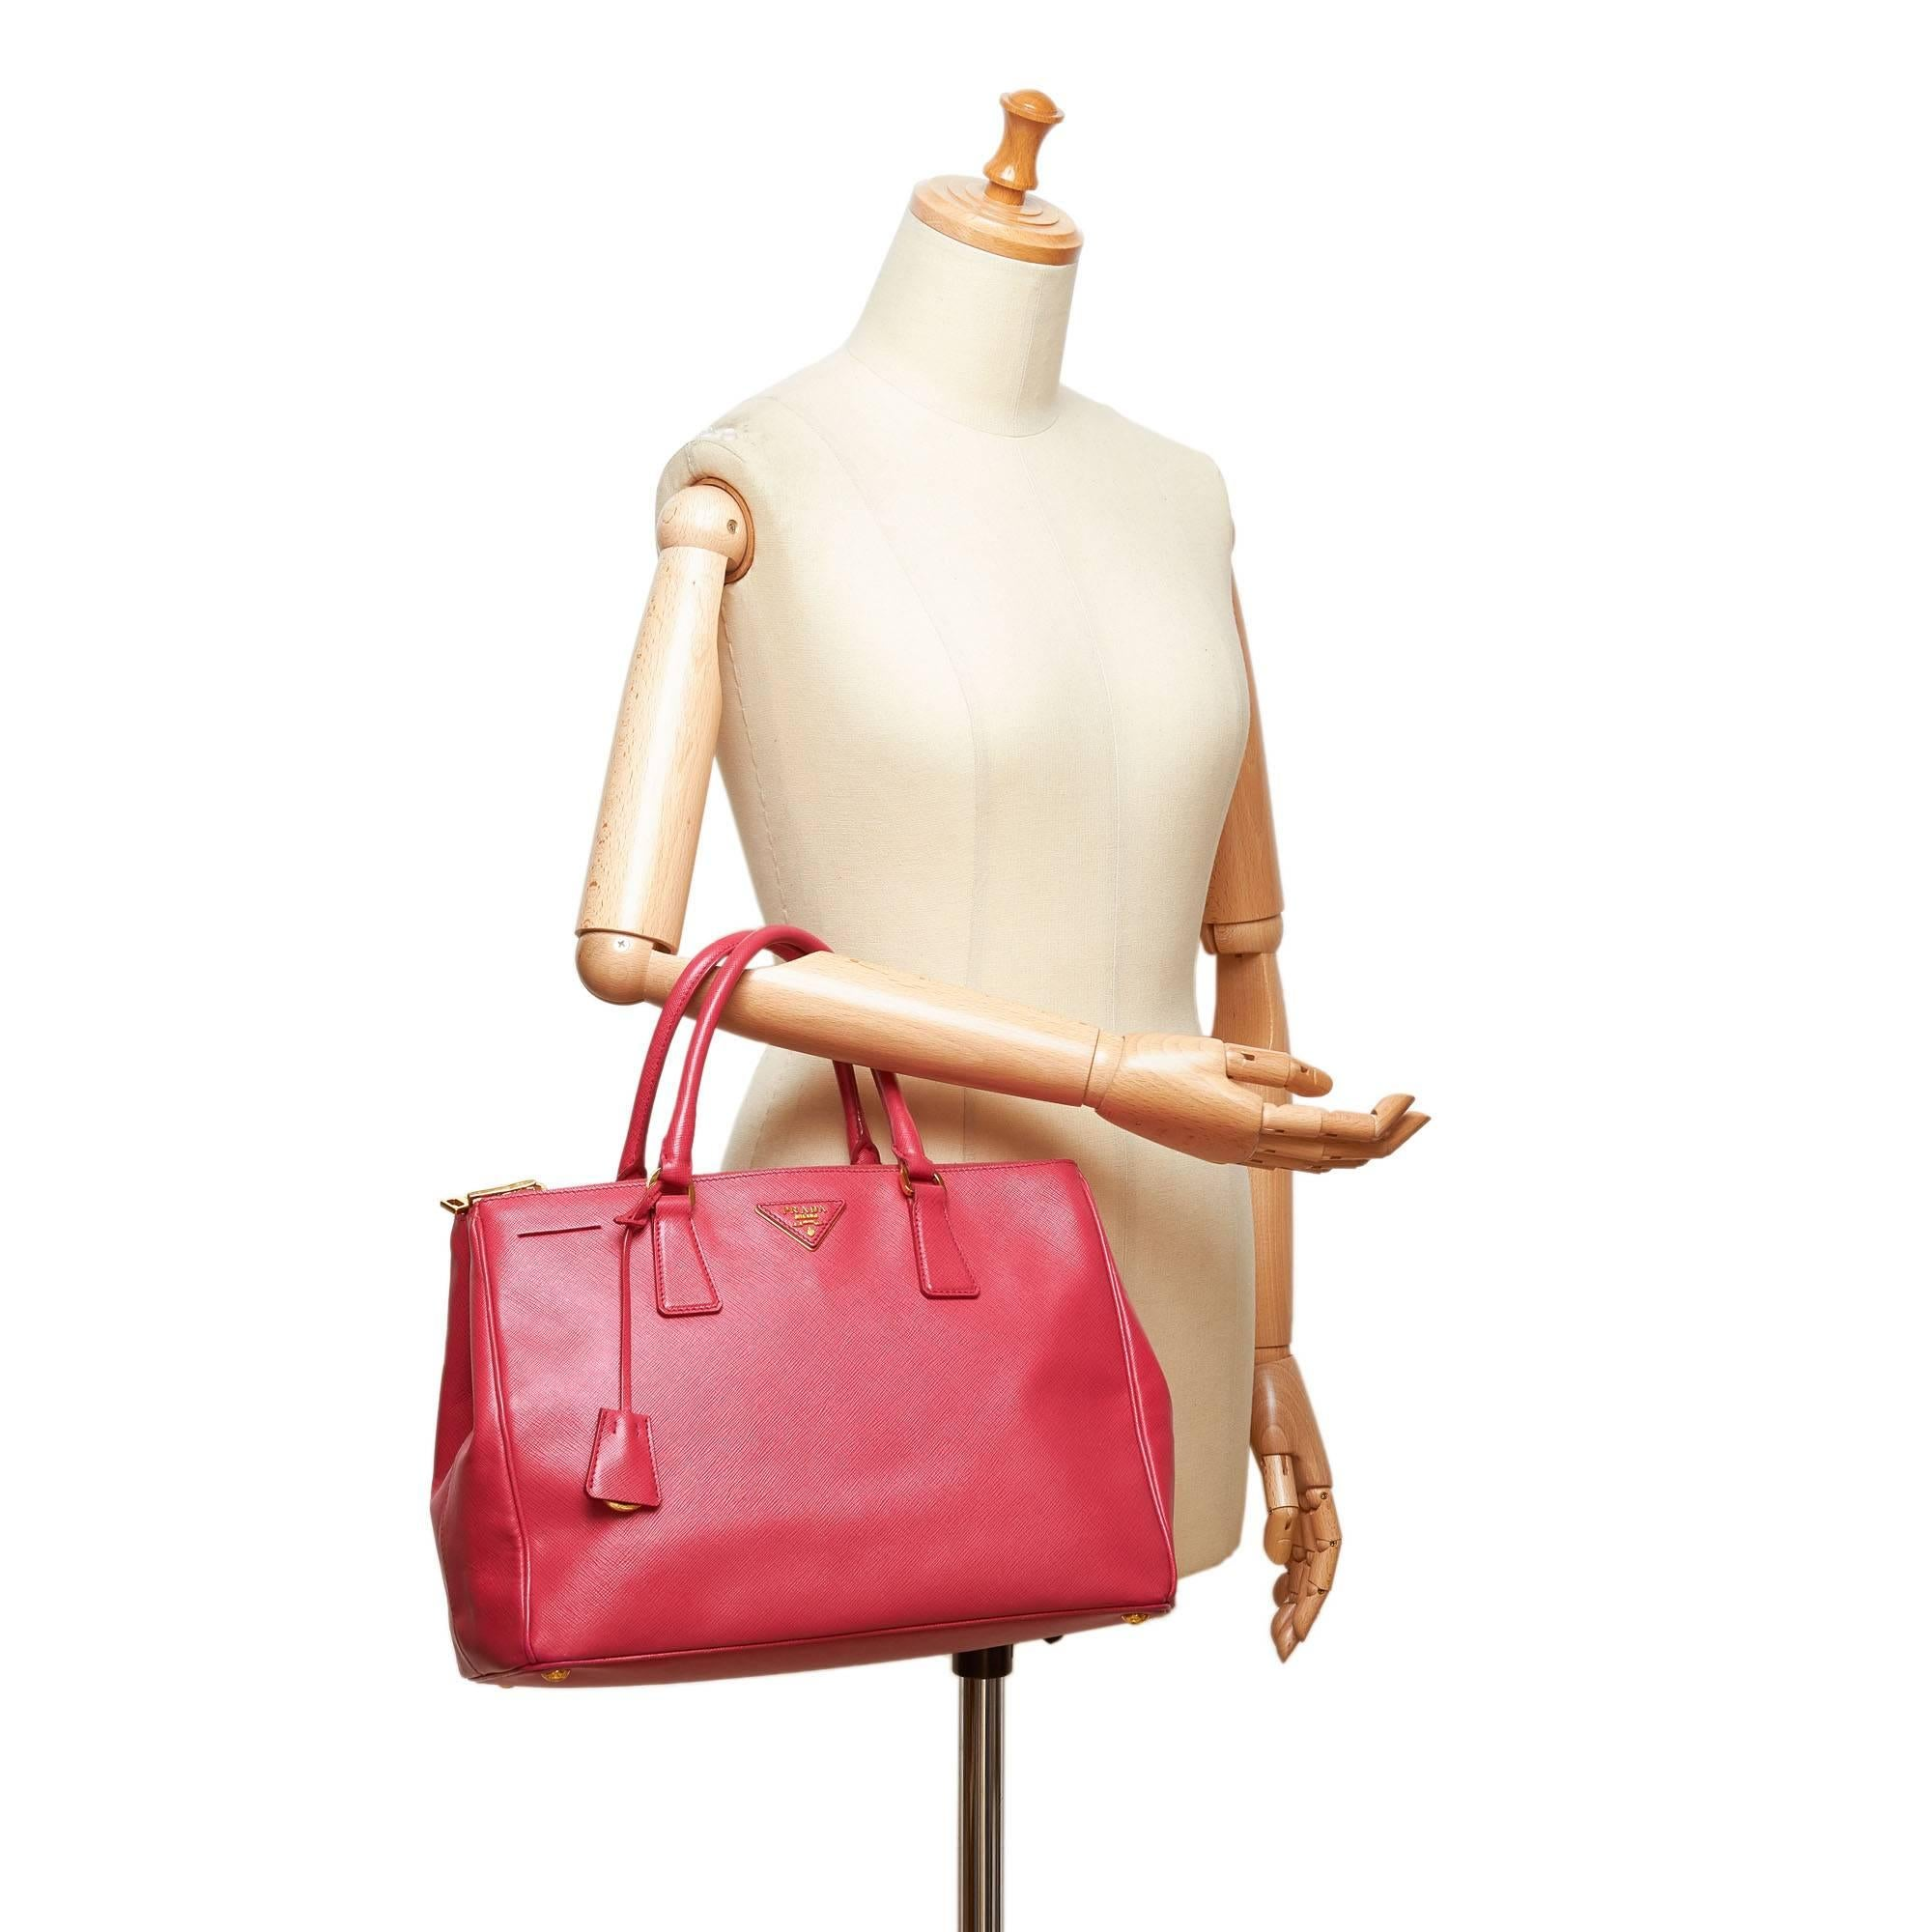 a5f9b2580efc ... denmark prada galleria saffiano small leather bag in white talco source  prada pink saffiano leather galleria